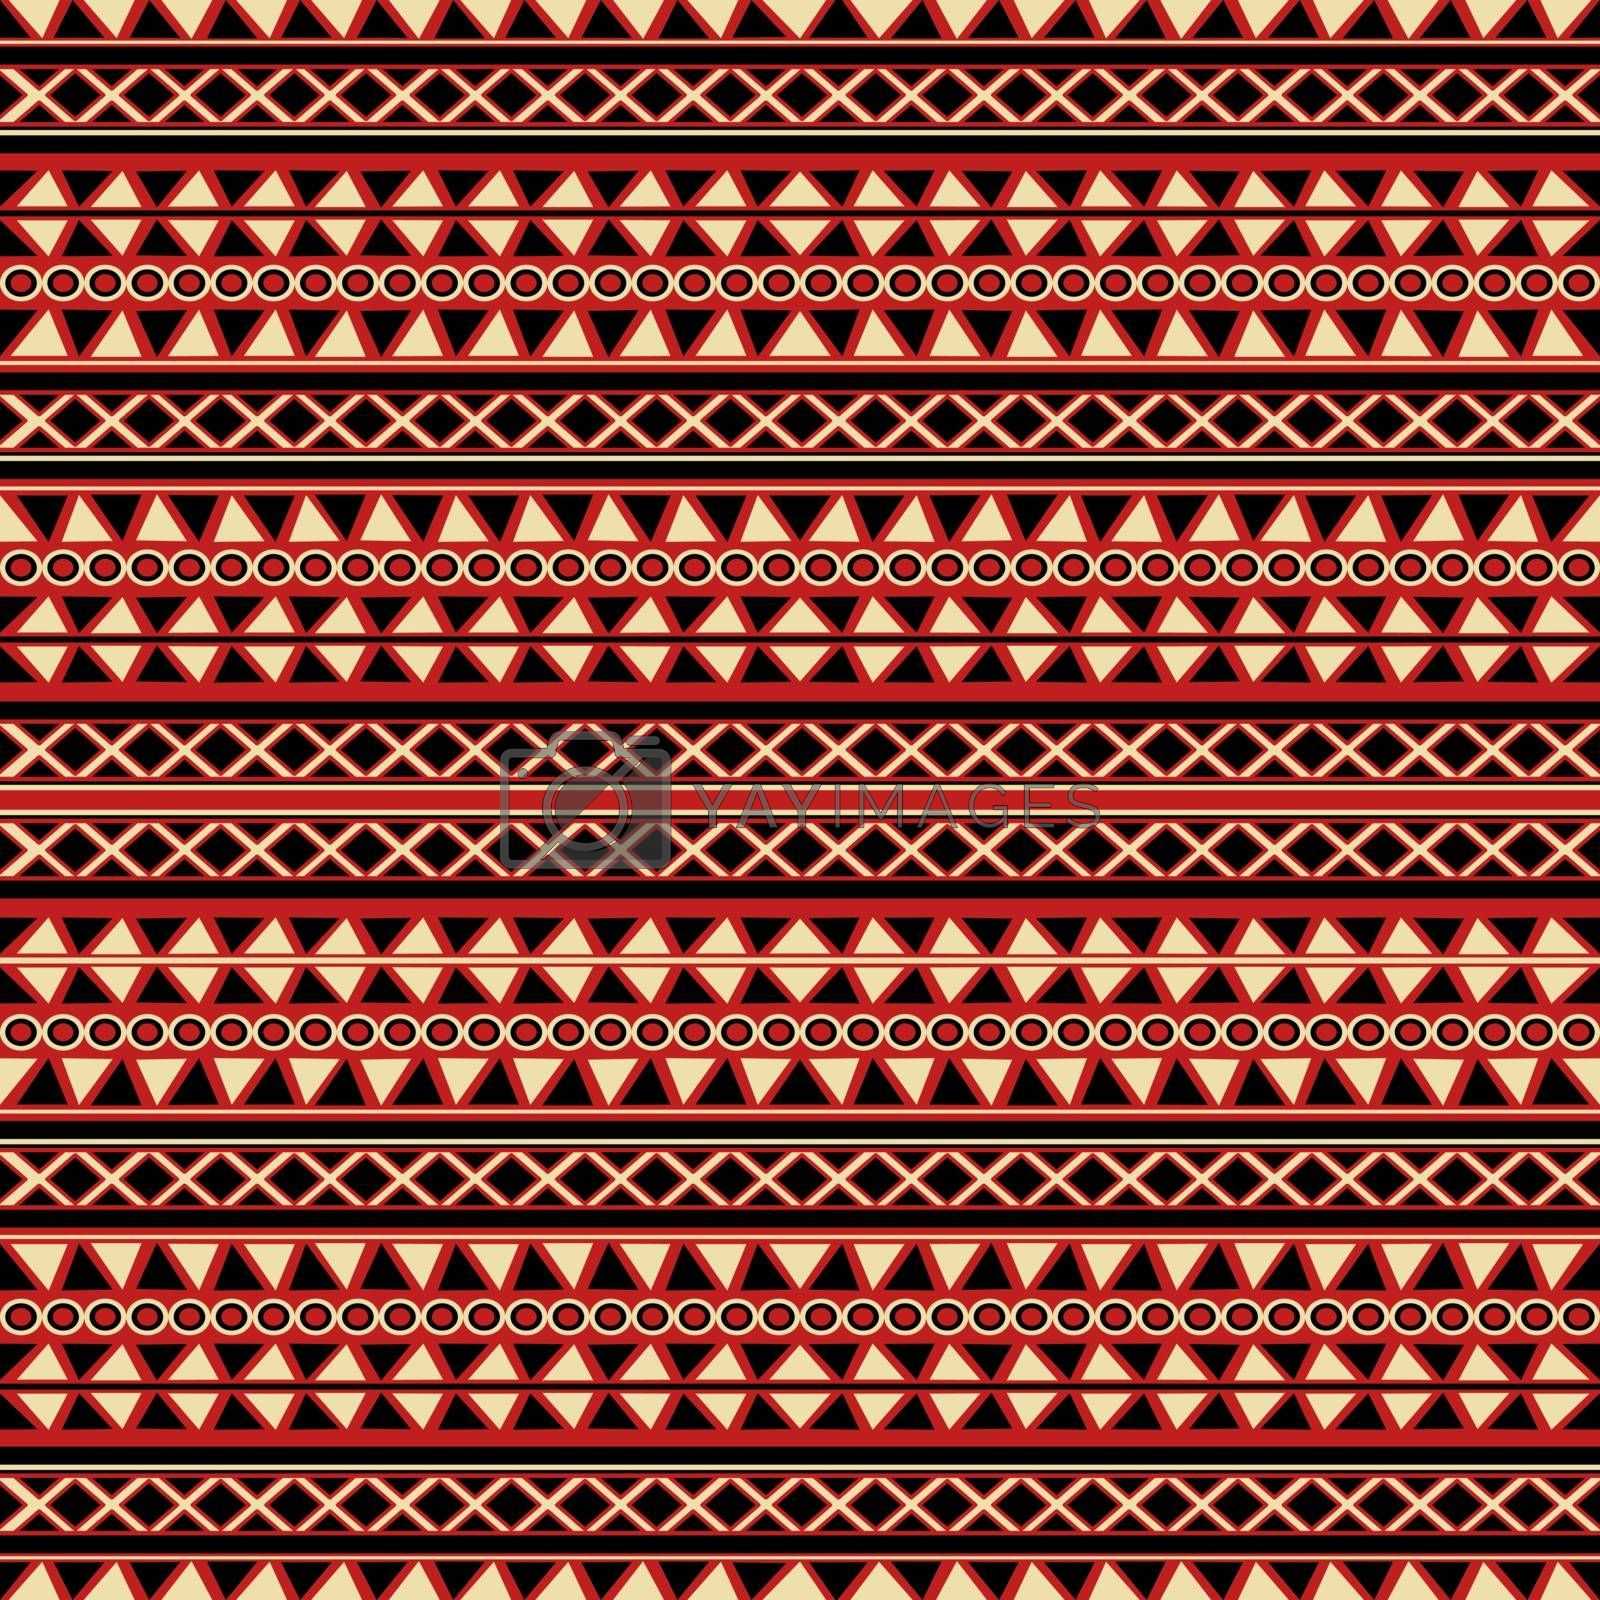 Decorative tribal background by Lirch